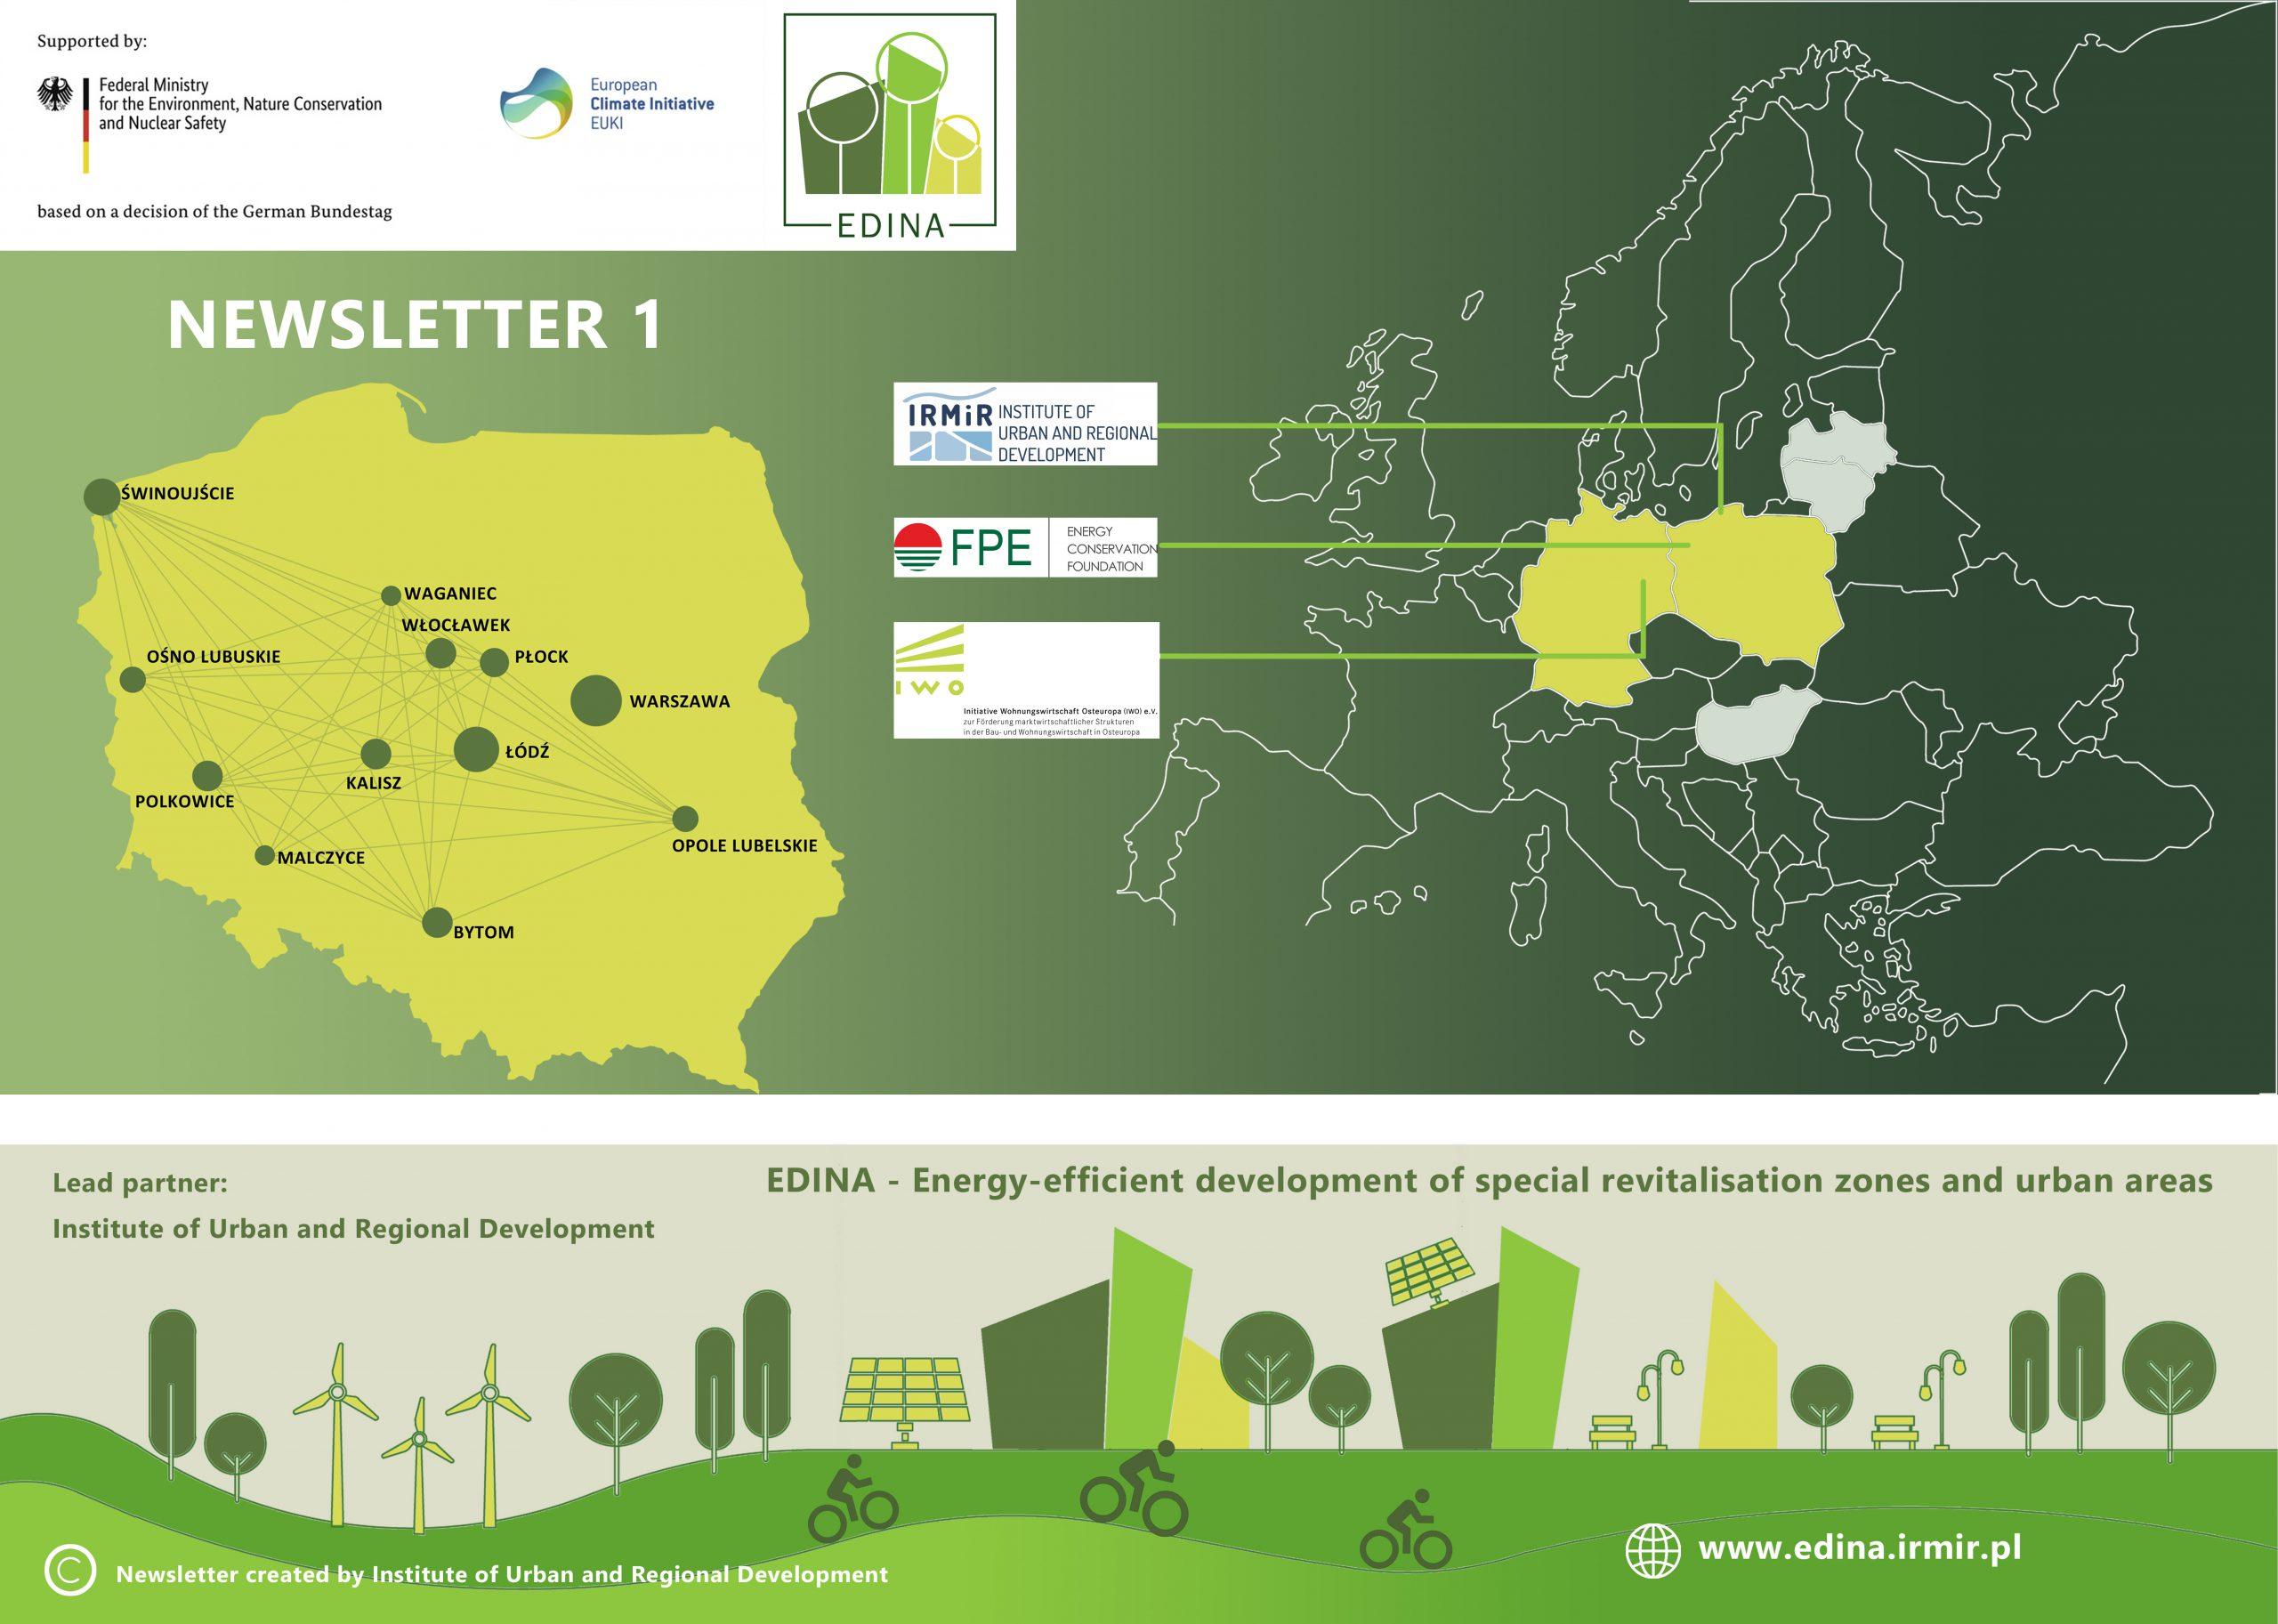 NEWSLETTER – EDINA – Energy-efficient development of special revitalisation zones and urban areas